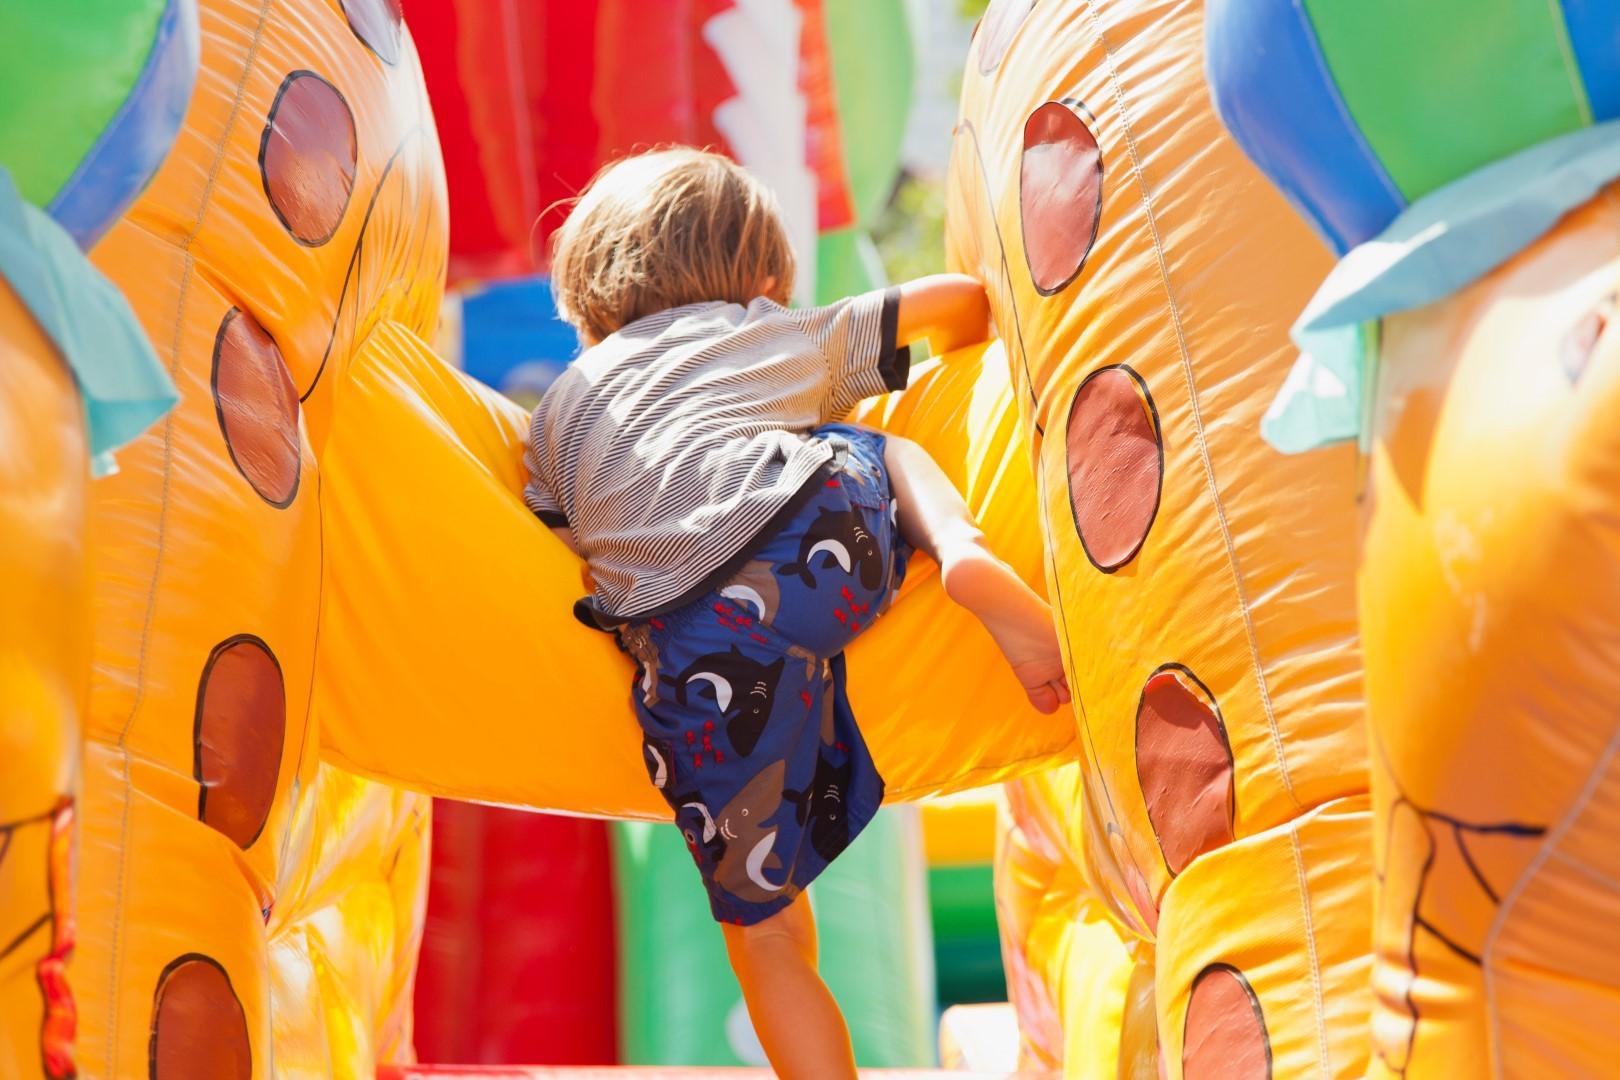 Boy playing in bouncy castle, rear view